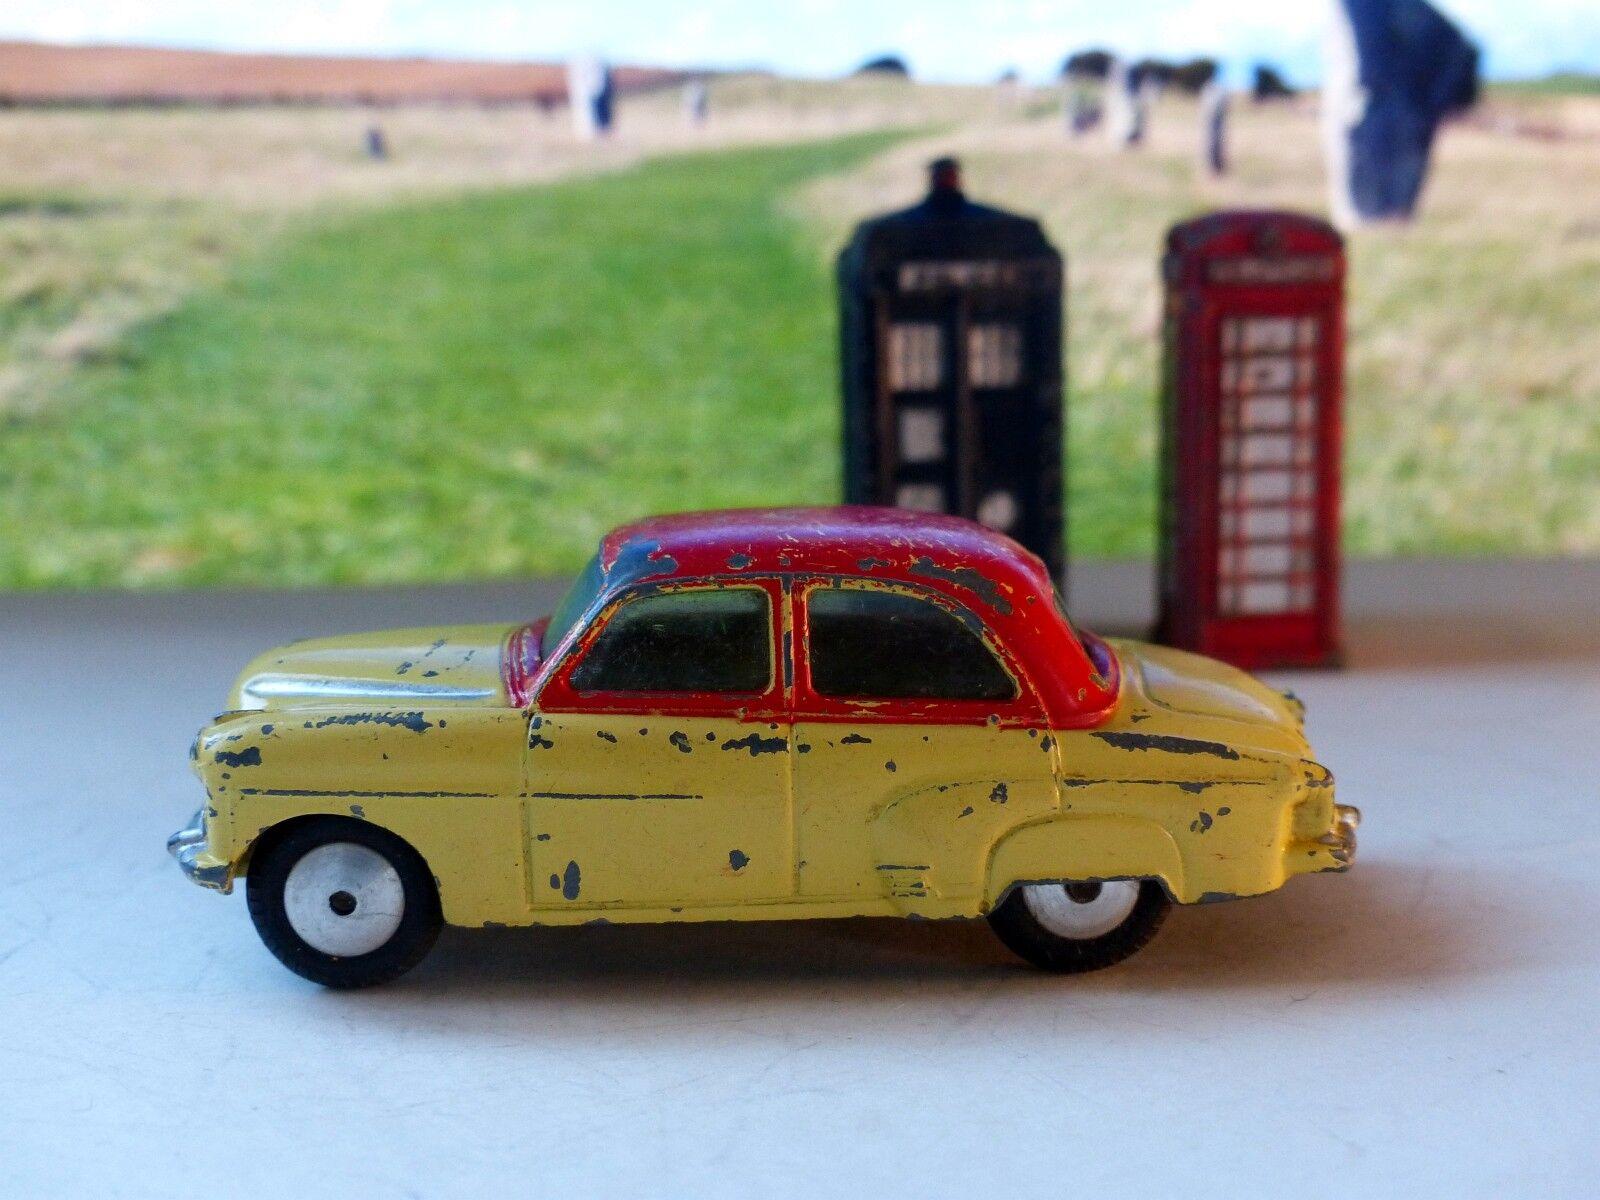 Corgi Toys 203 Vauxhall Velox two-tone edition